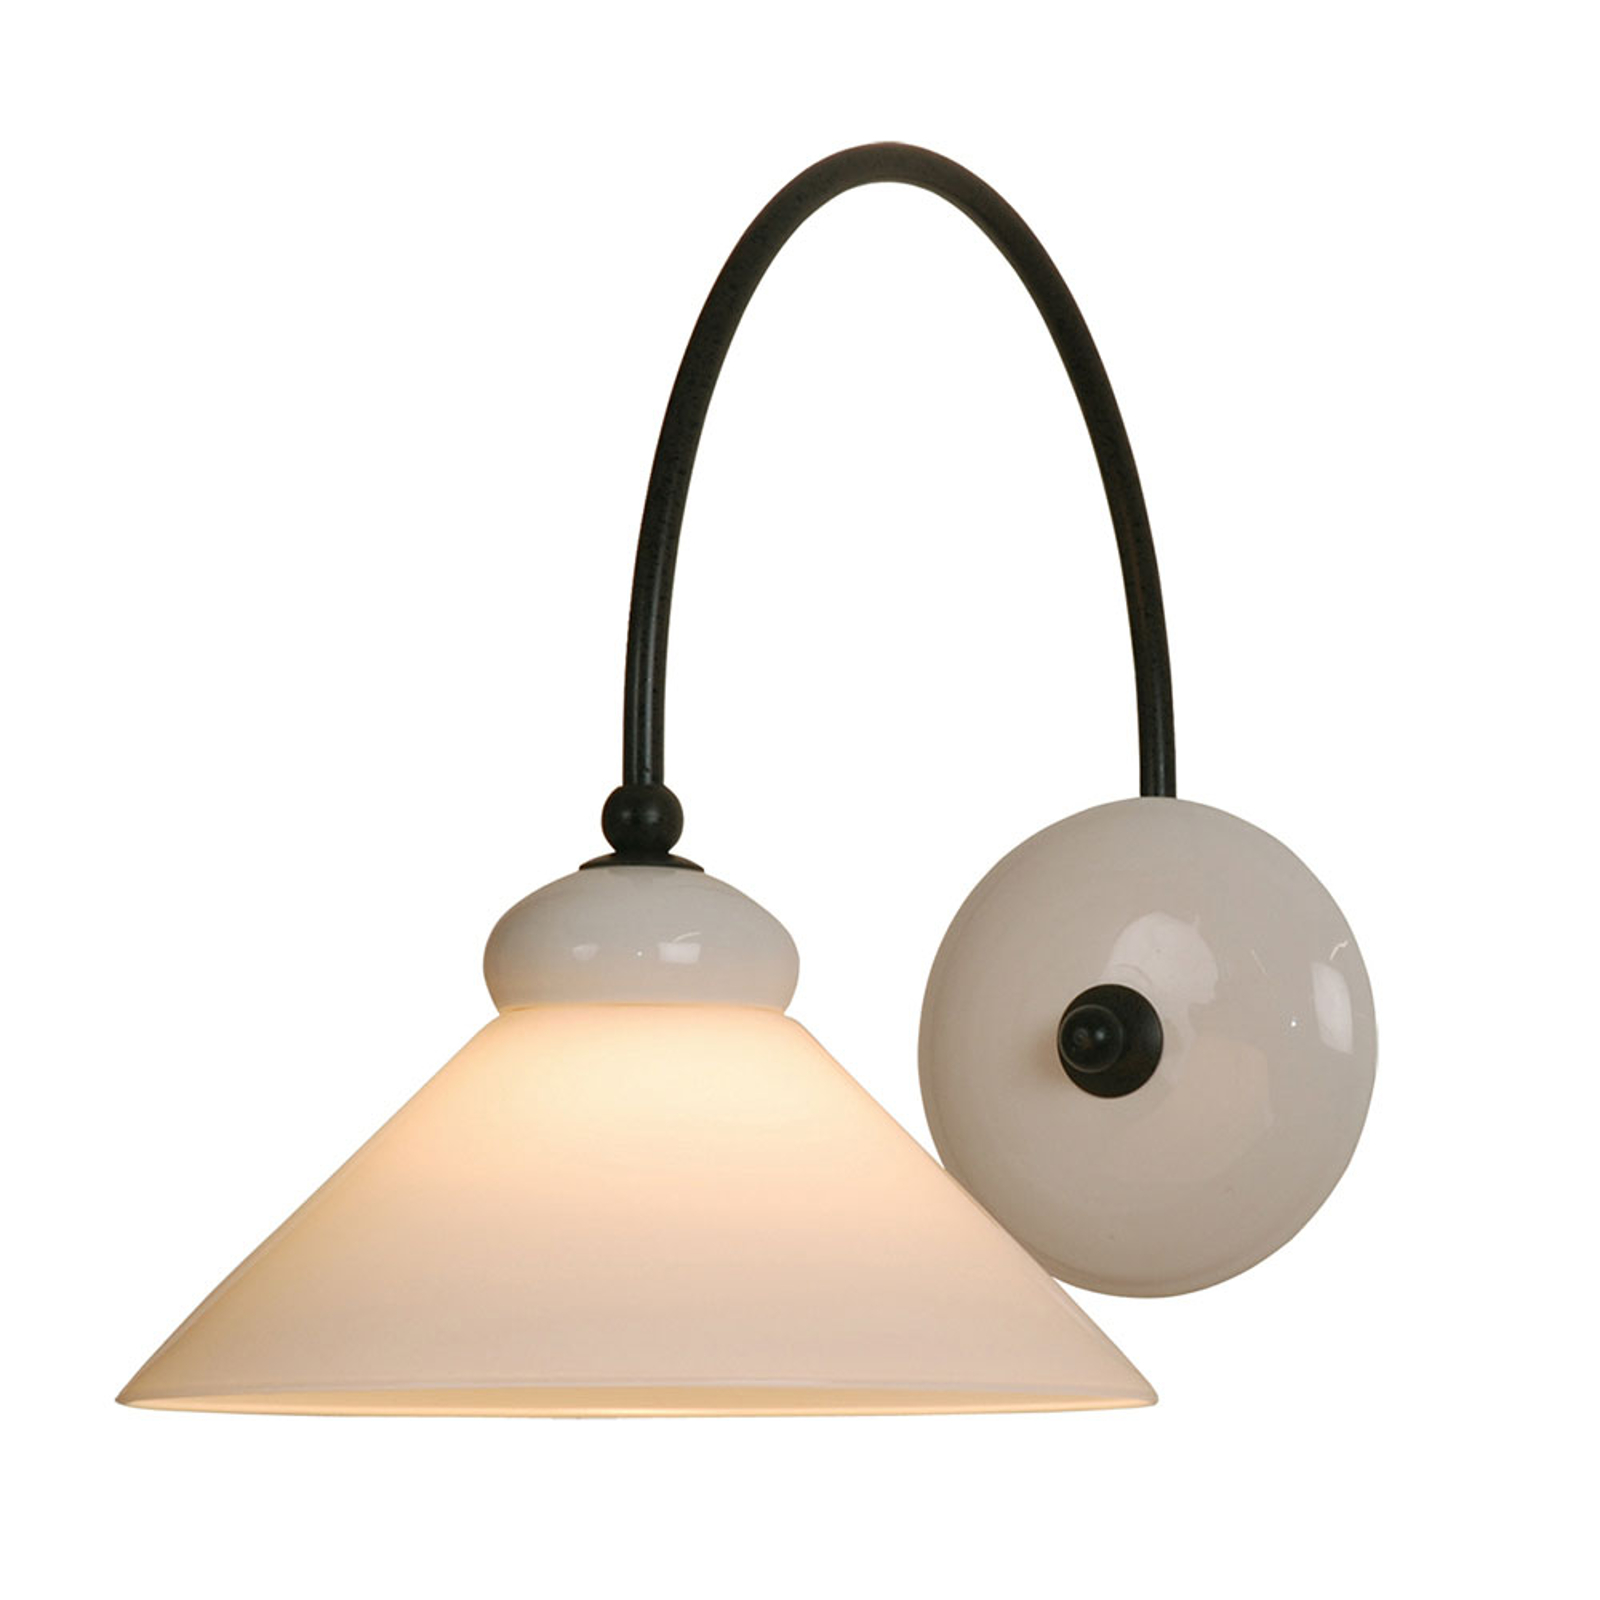 Menzel Provence La Maison wandlamp, kap wit